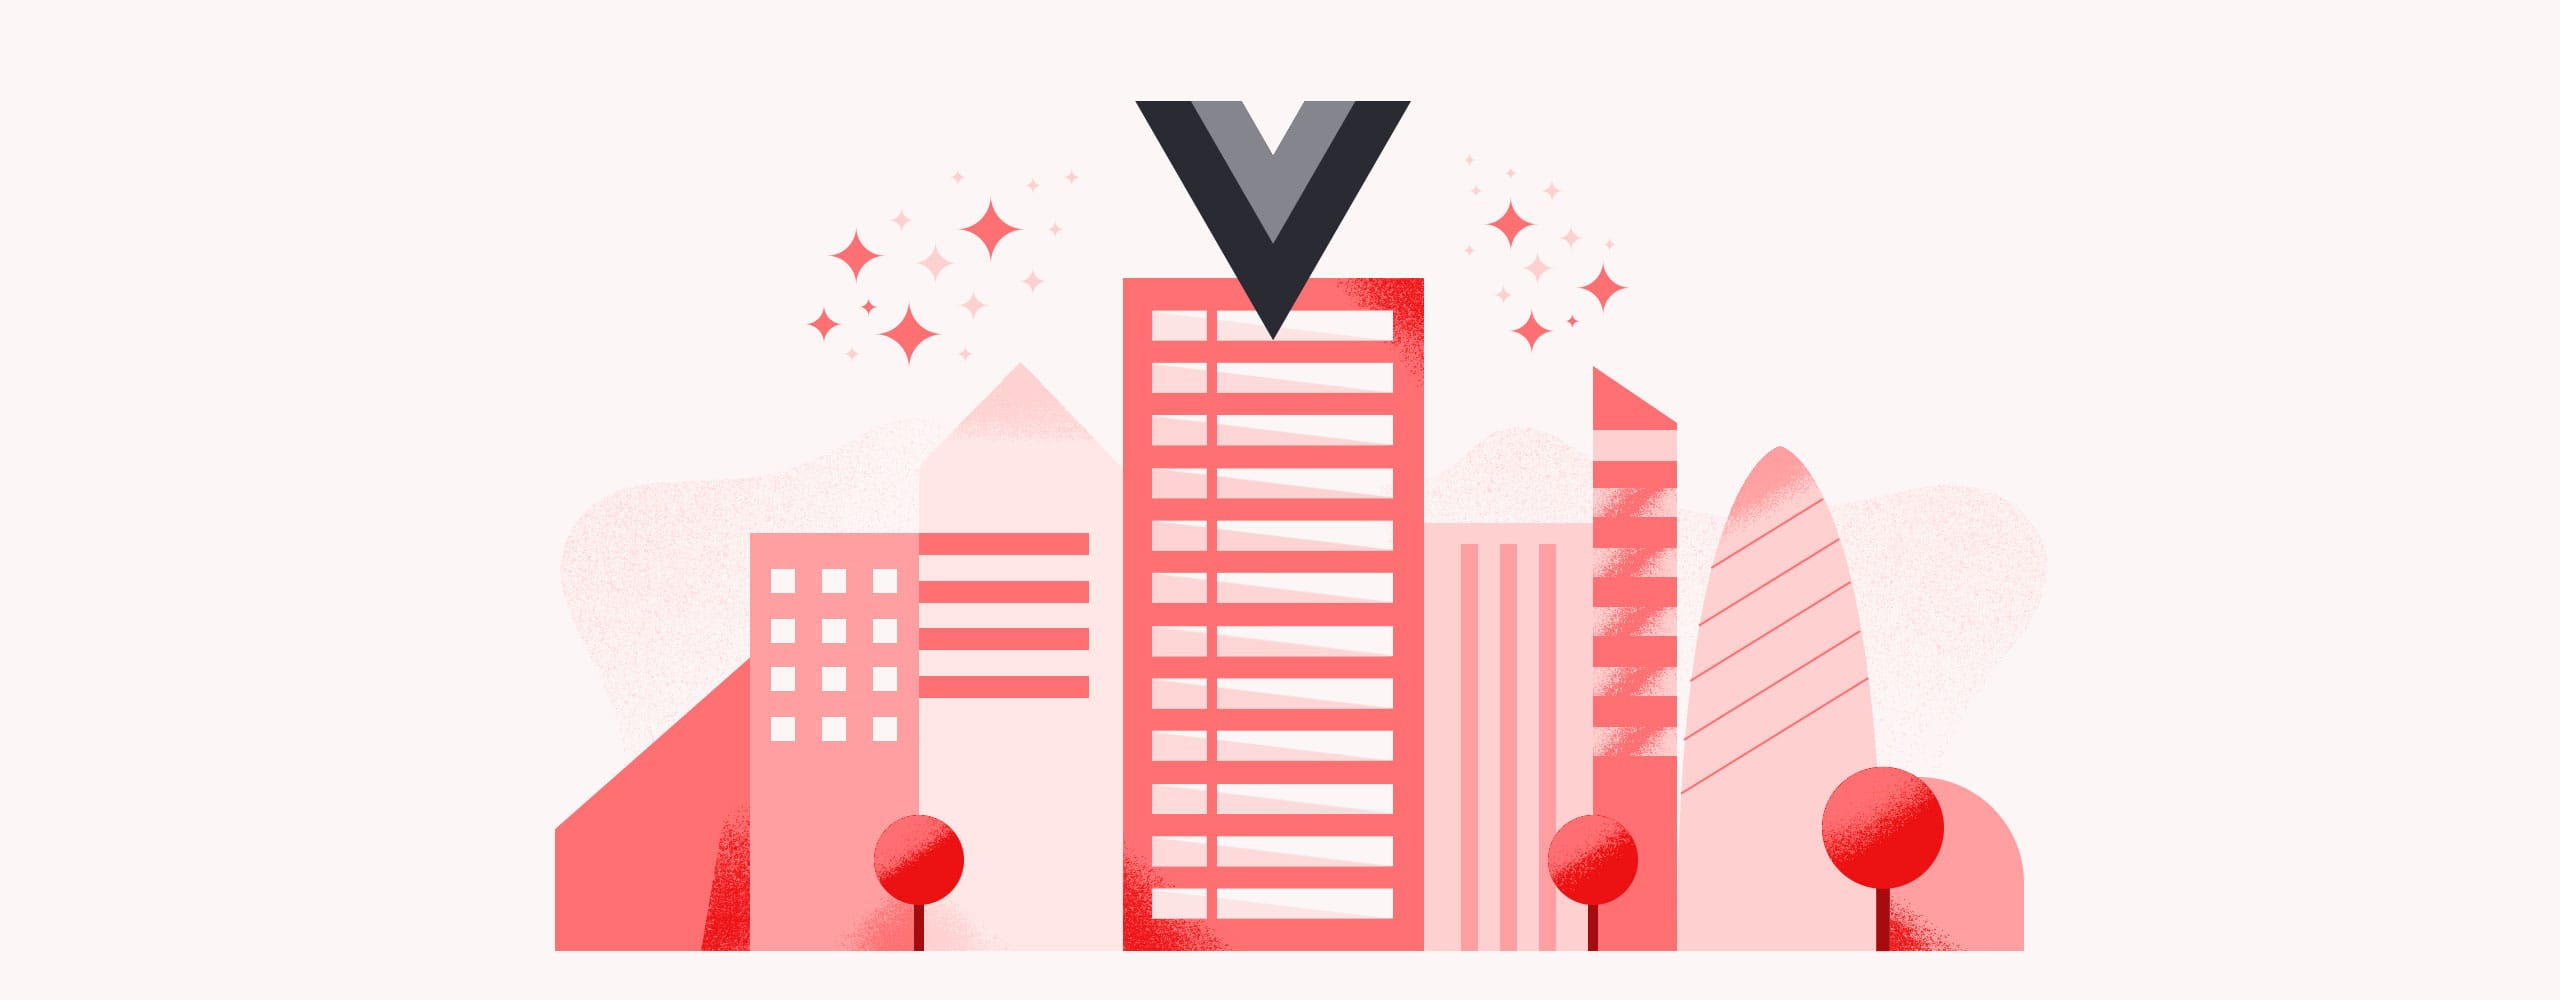 Is Vue js Enterprise-Ready?—Large Scale Apps Use Cases